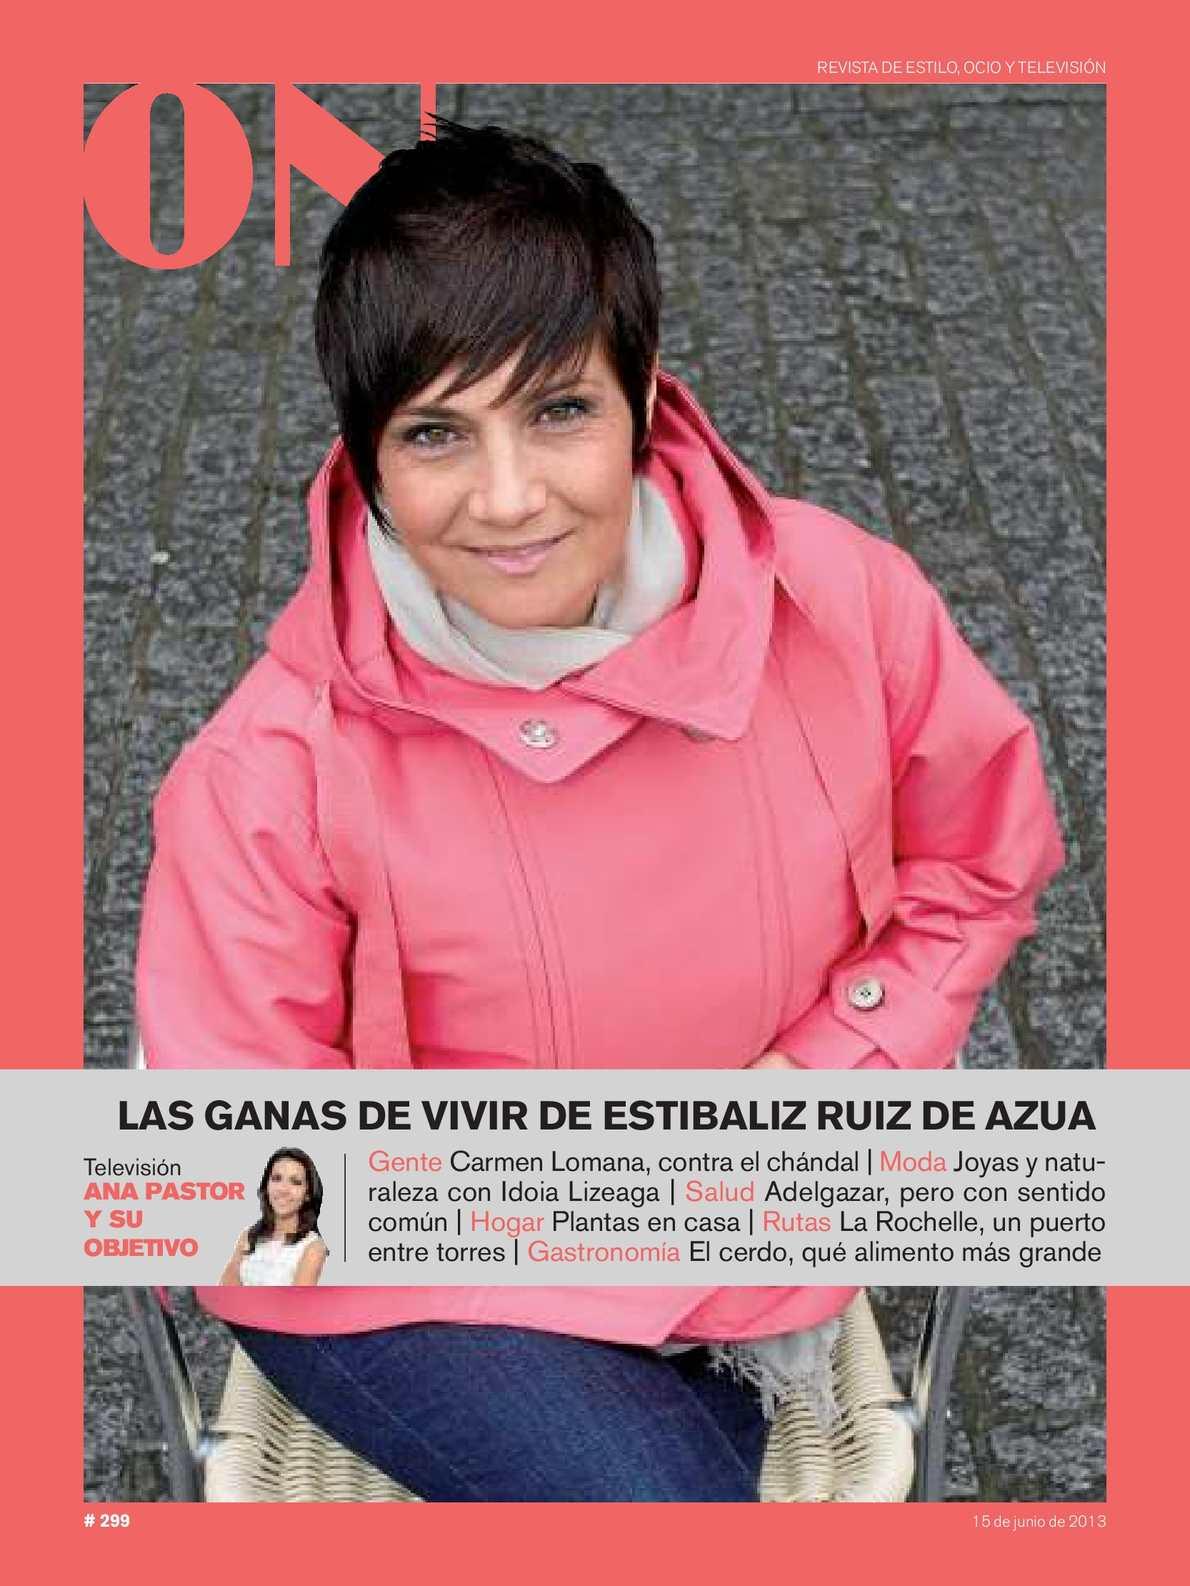 c925e8170 Calaméo - ON Revista de Ocio y Estilo 20130615